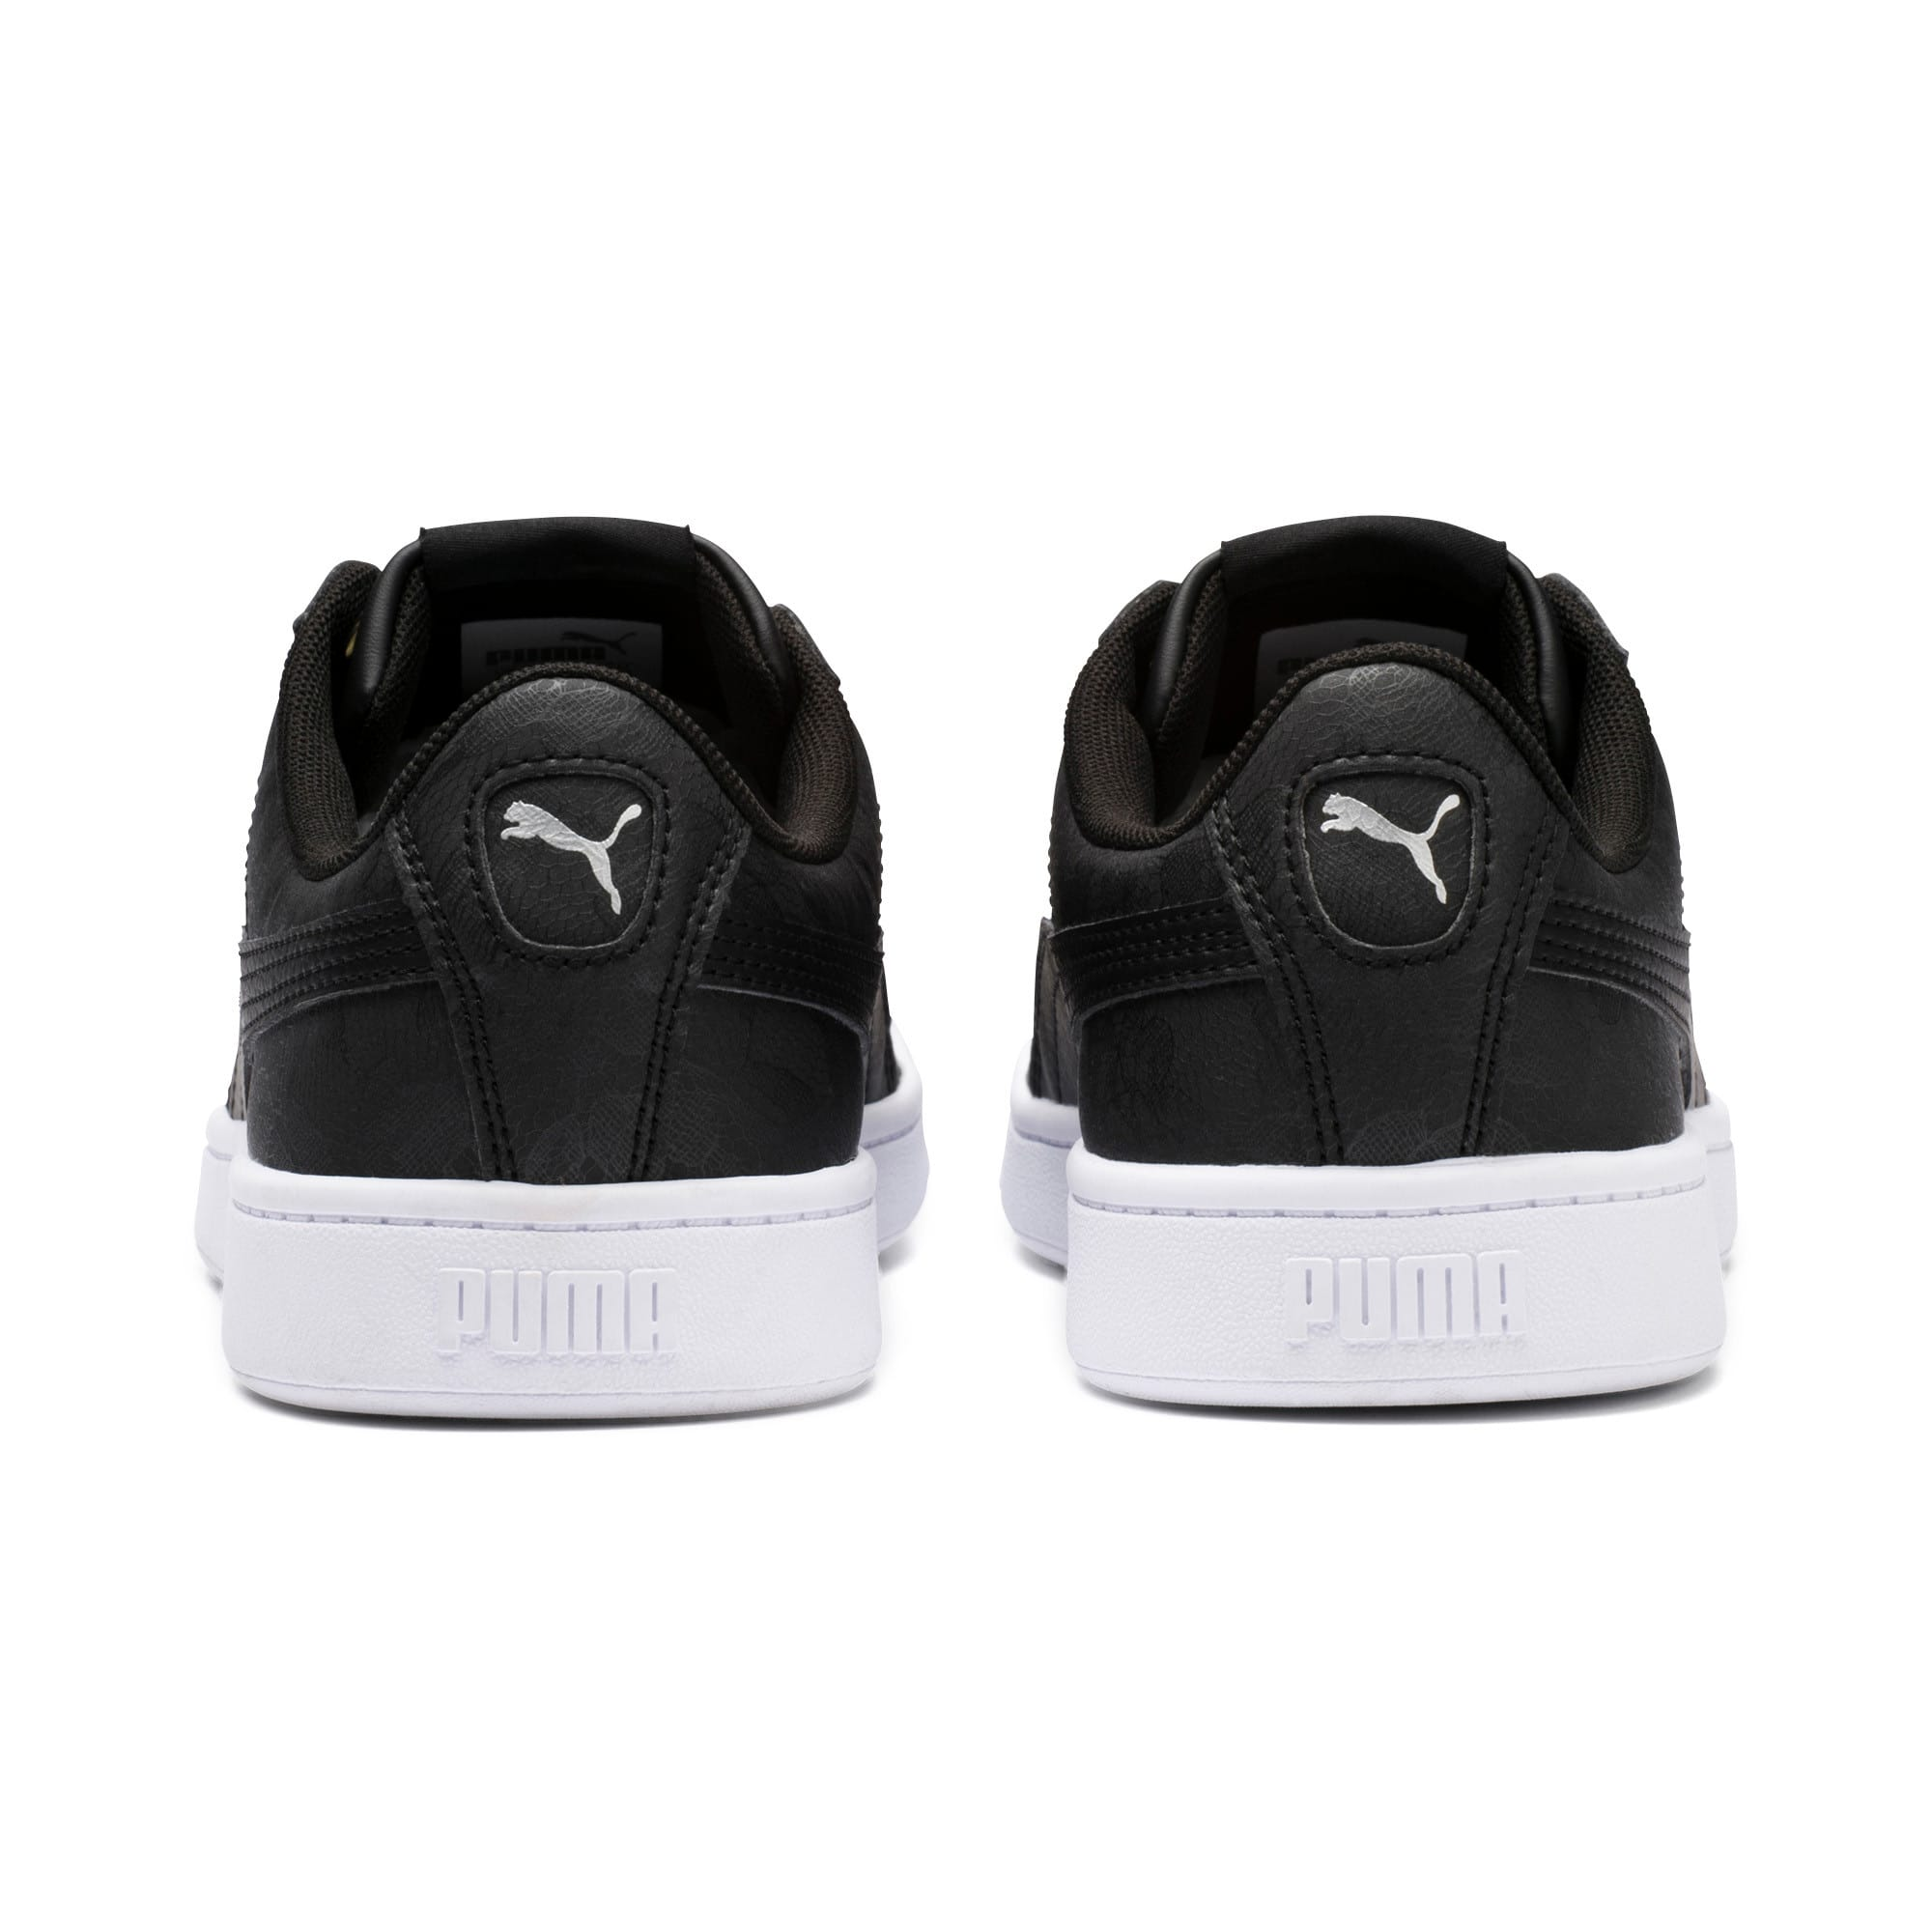 Thumbnail 4 of PUMA Vikky v2 Summer Women's Sneakers, Puma Black-Silver-Puma White, medium